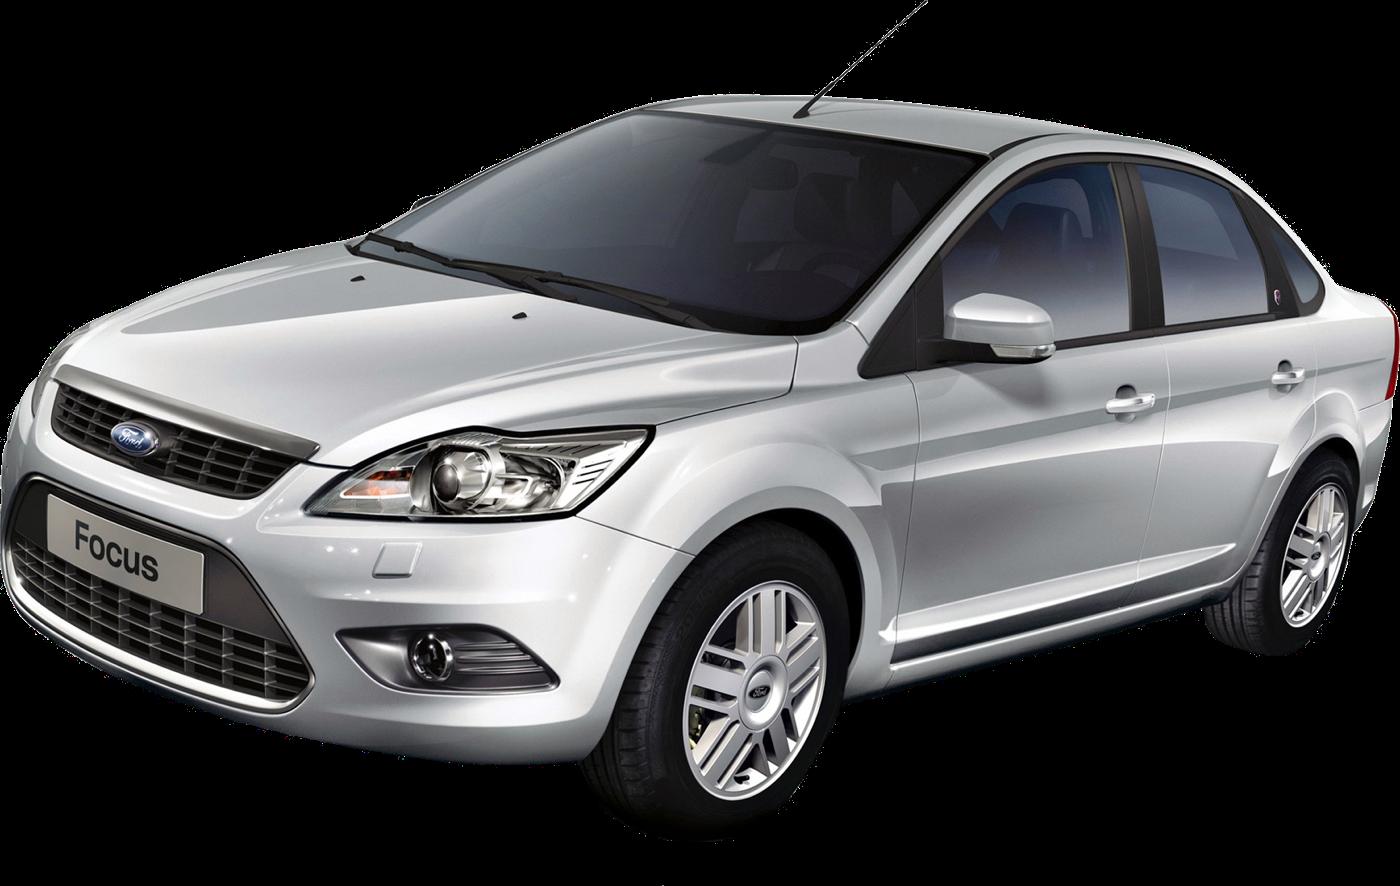 Mrcr voiture ford render de benbrahemb - Voiture the cars ...